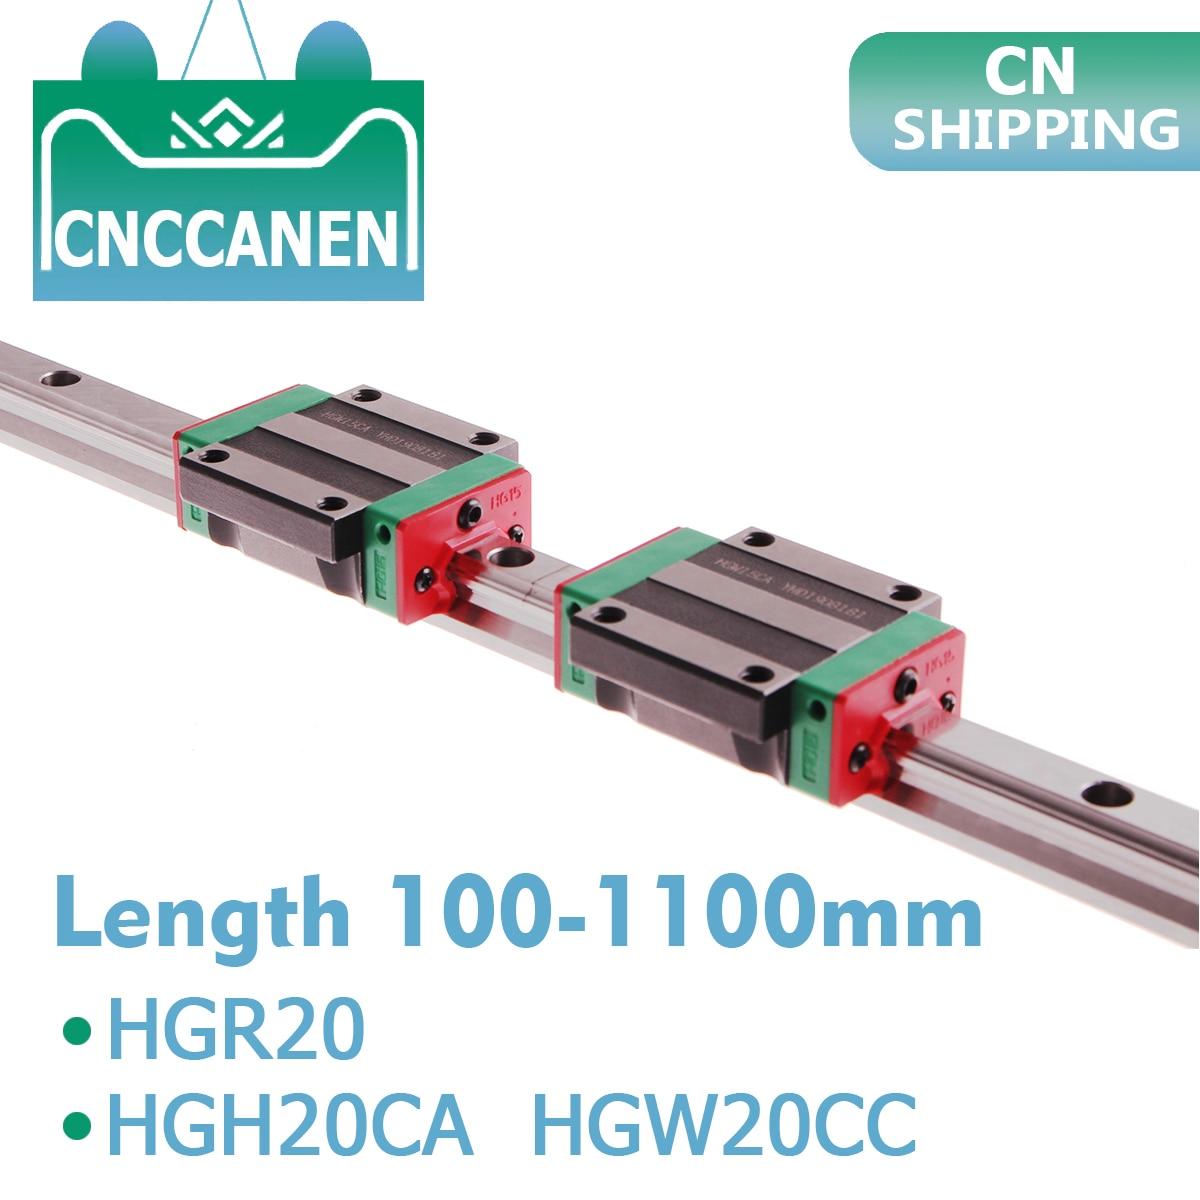 High Precision HGR20 Linear guide rail 6Pcs 12Pcs HGW20 carriages